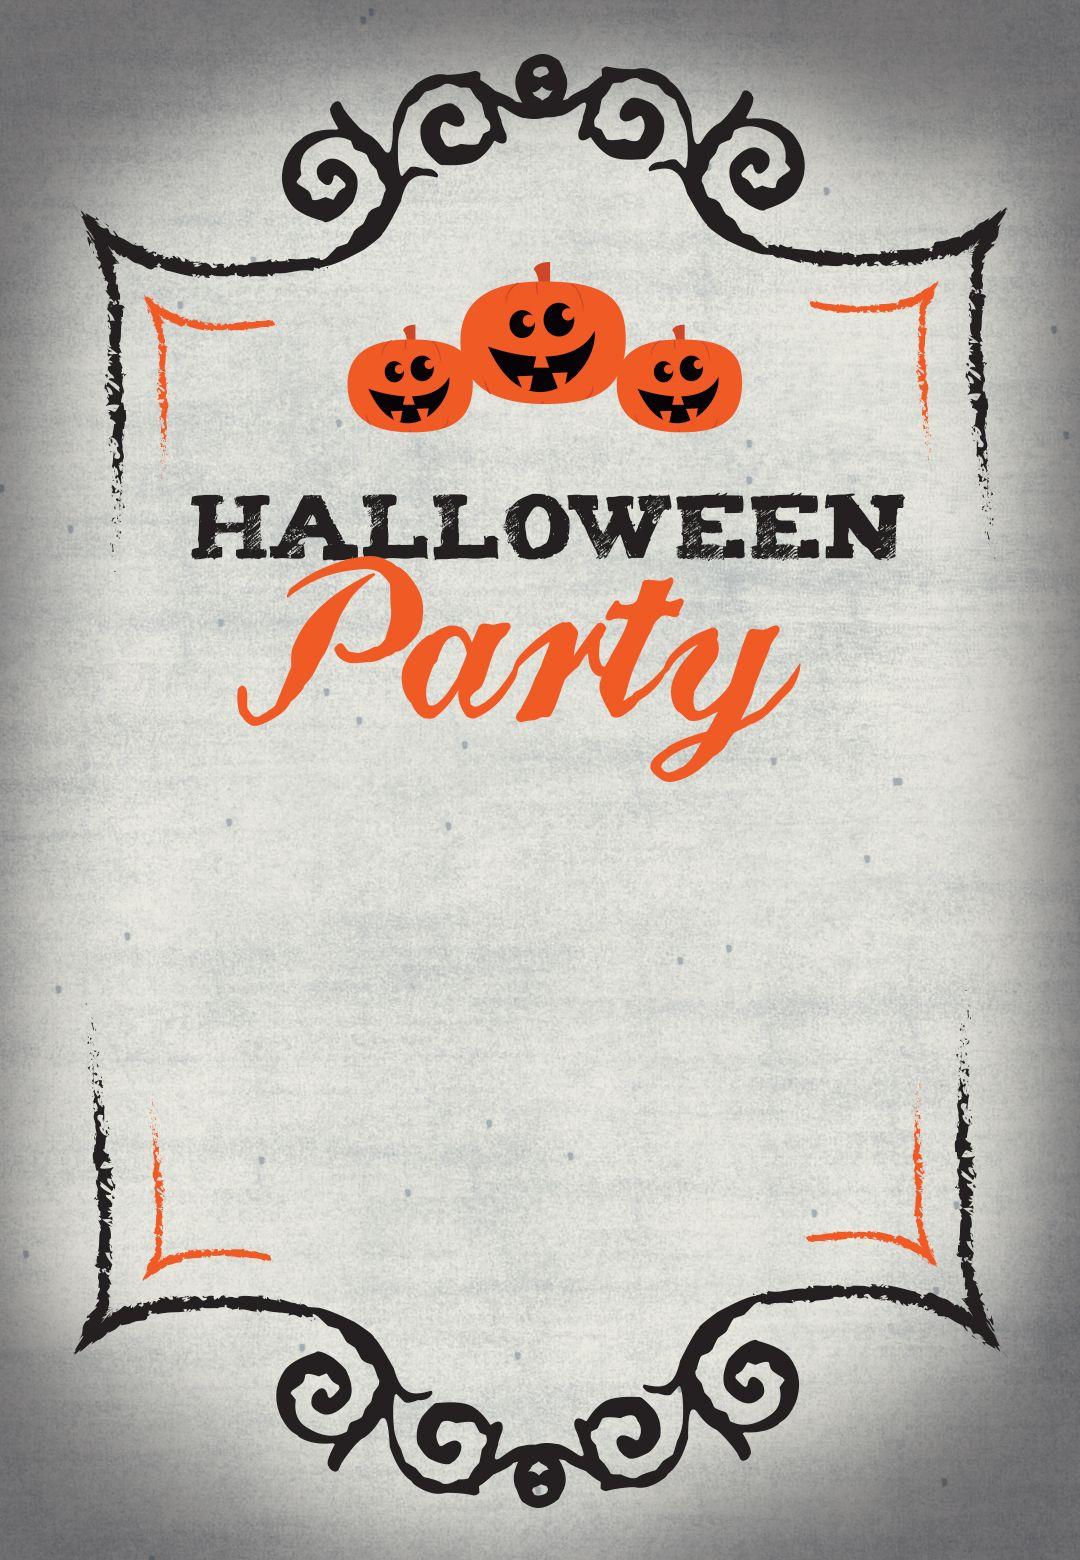 Halloween Party - Free Printable Halloween Invitation Template - Free Printable Halloween Invitations